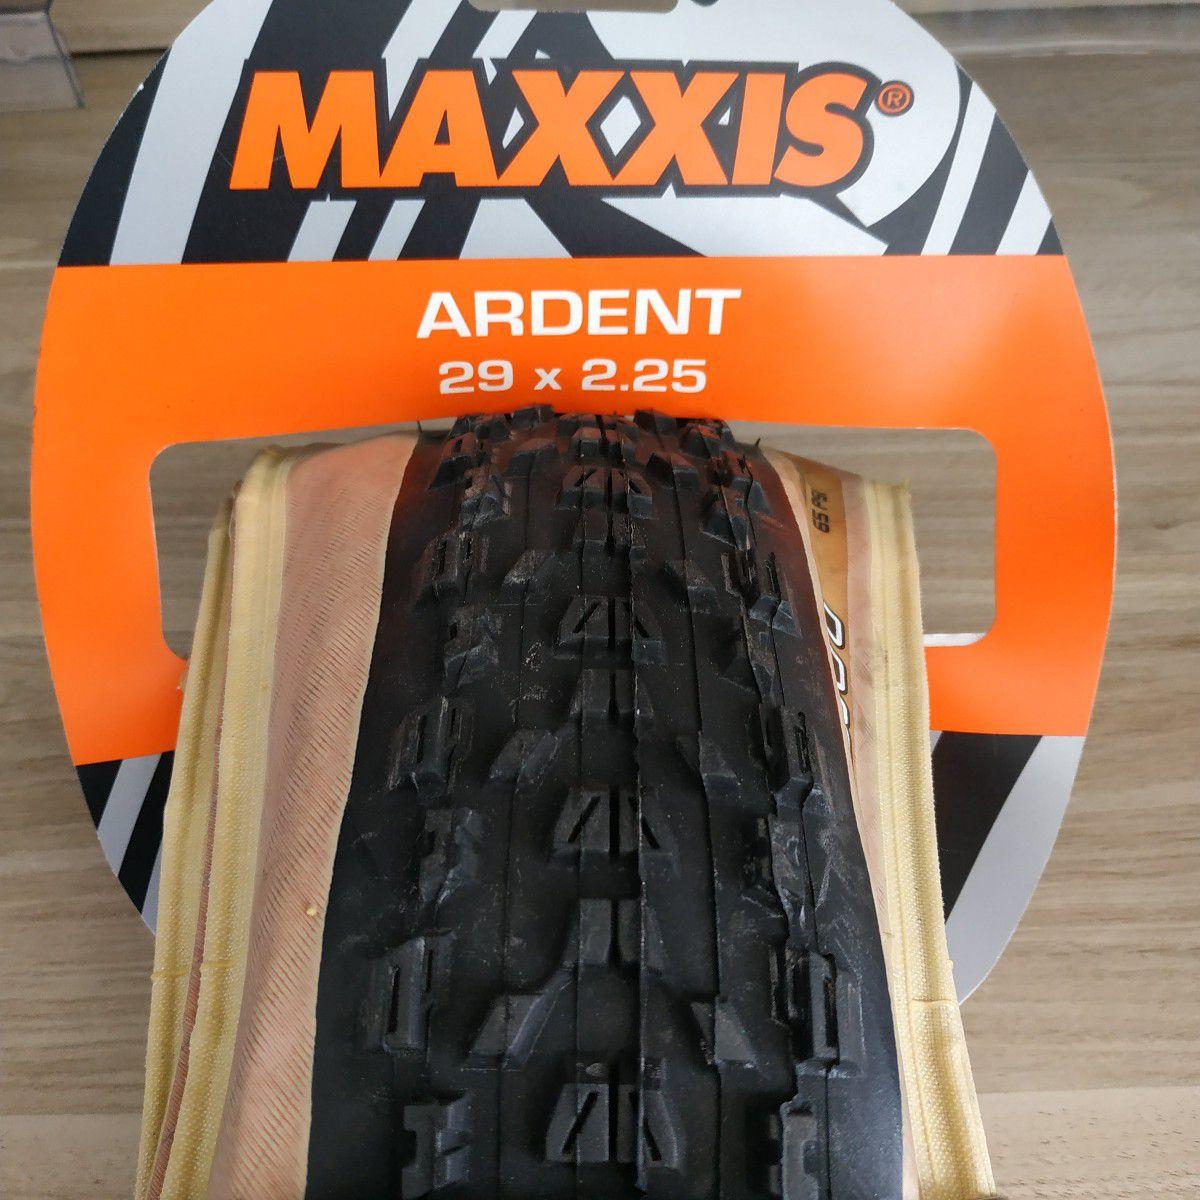 Pneu Maxxis 29 x 2.25 Ardent M315 Skinwall com faixa bege